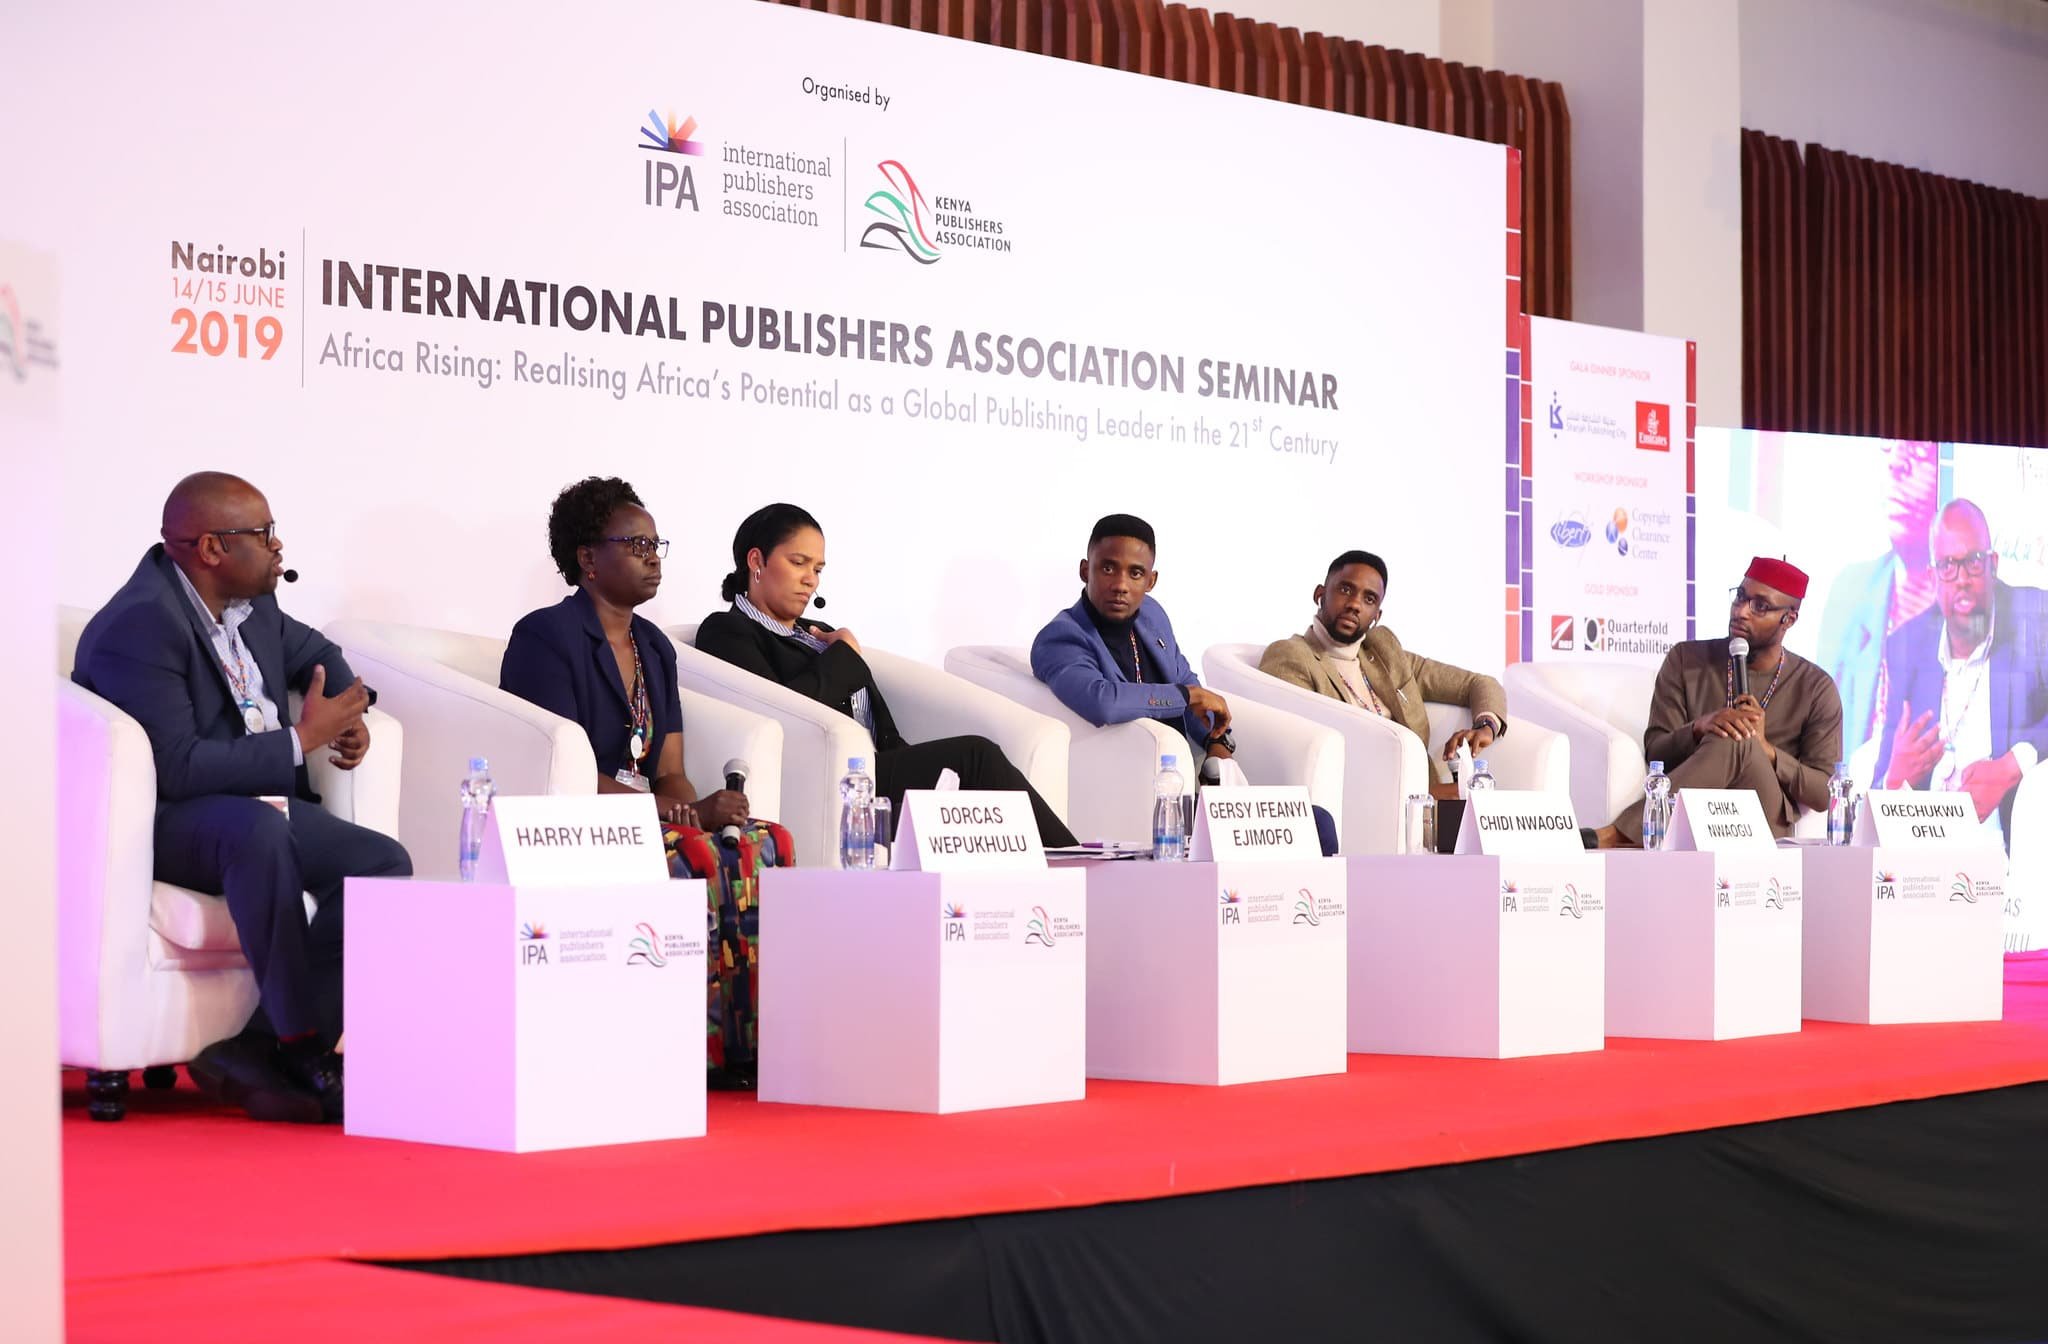 internation publishers association and publiseer digital media